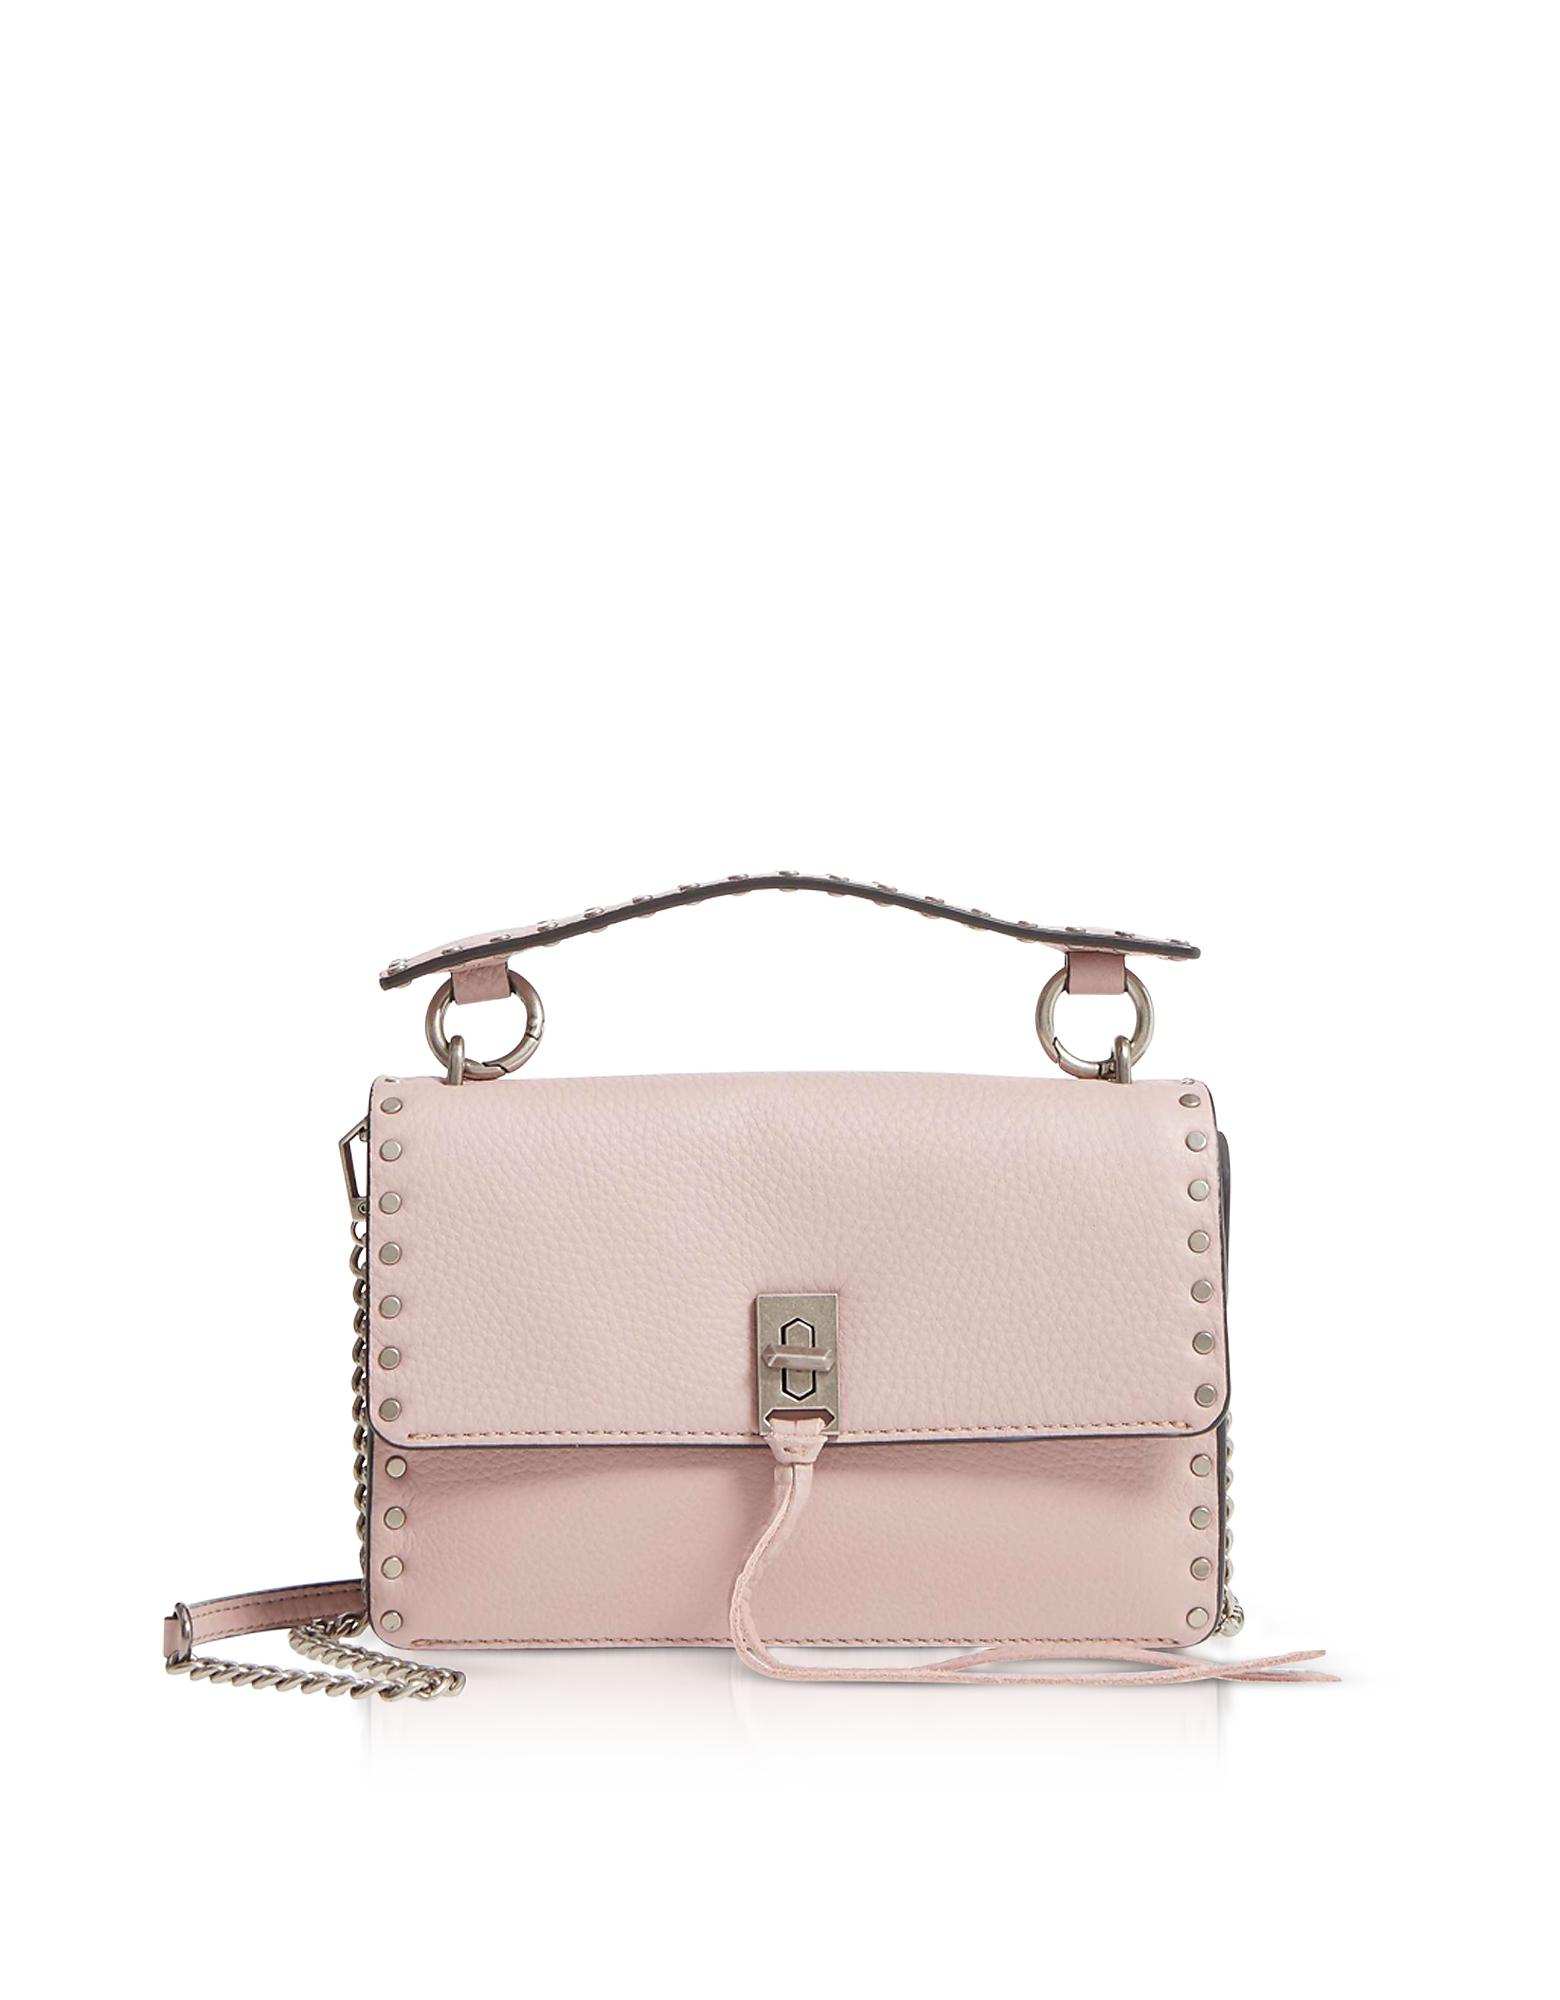 Rebecca Minkoff Designer Handbags, Vintage Pink Leather Darren Top Handle Flap Crossbody